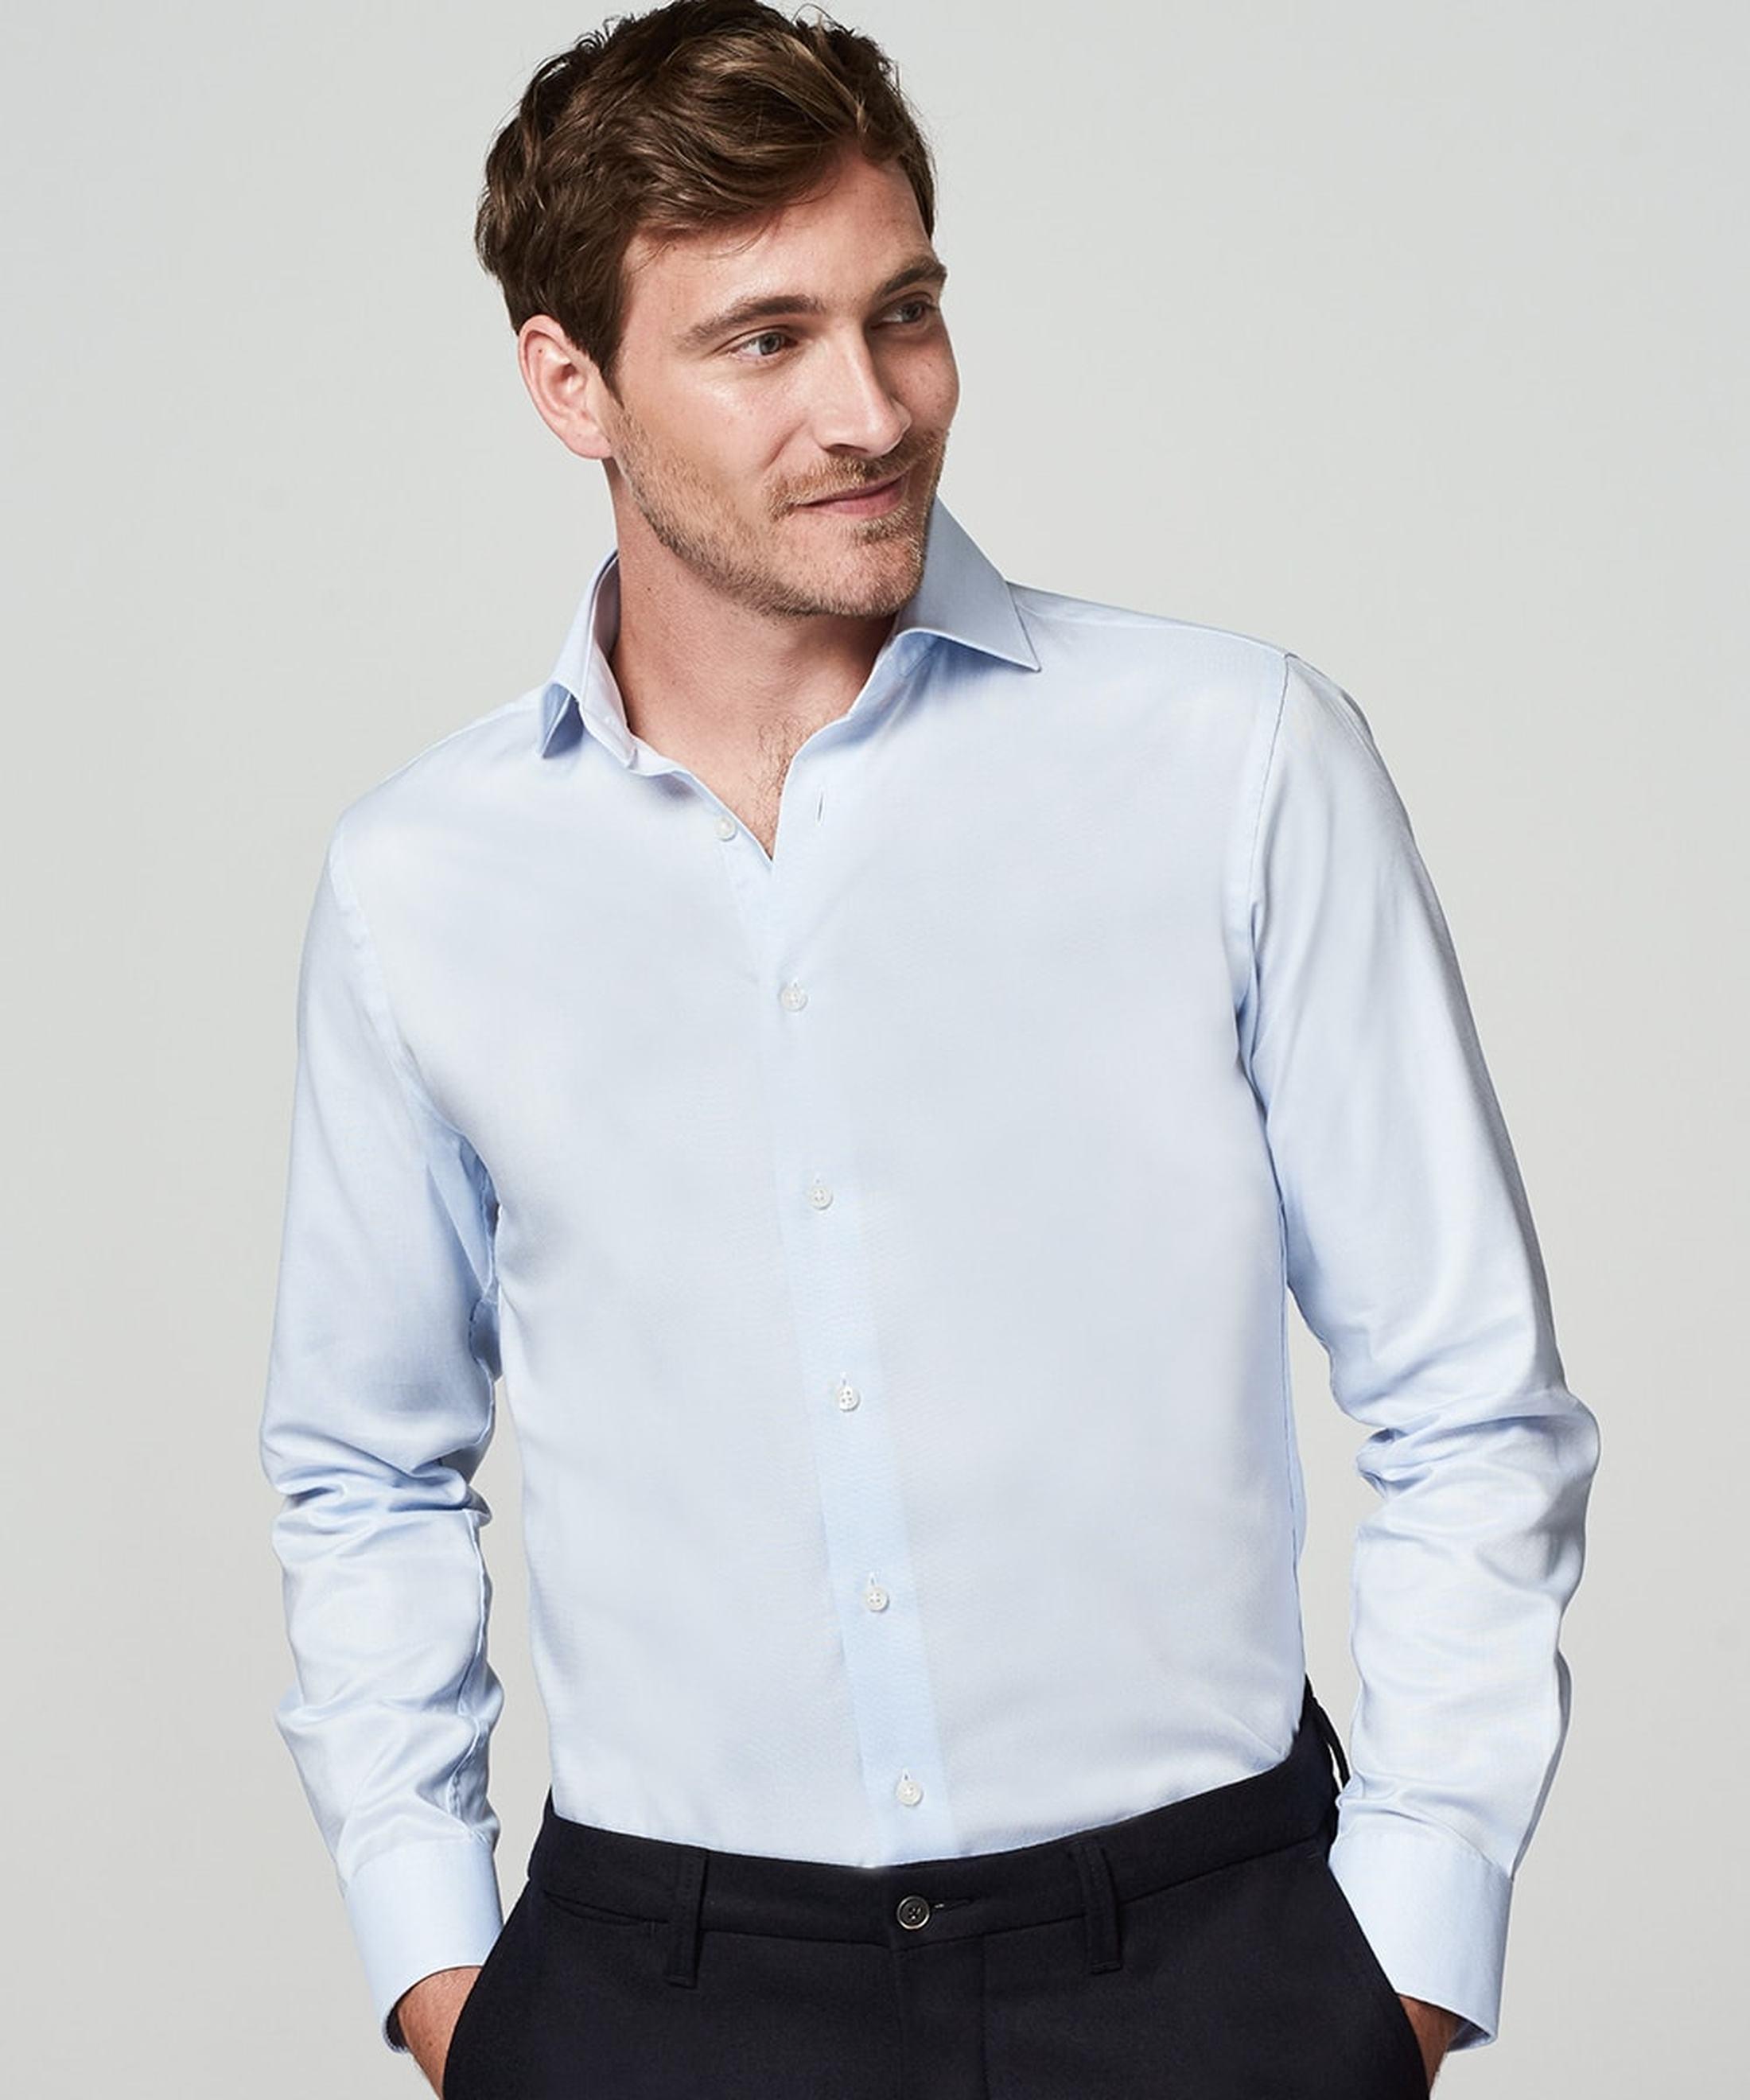 Michaelis Overhemd SlimFit Blue Dessin foto 1